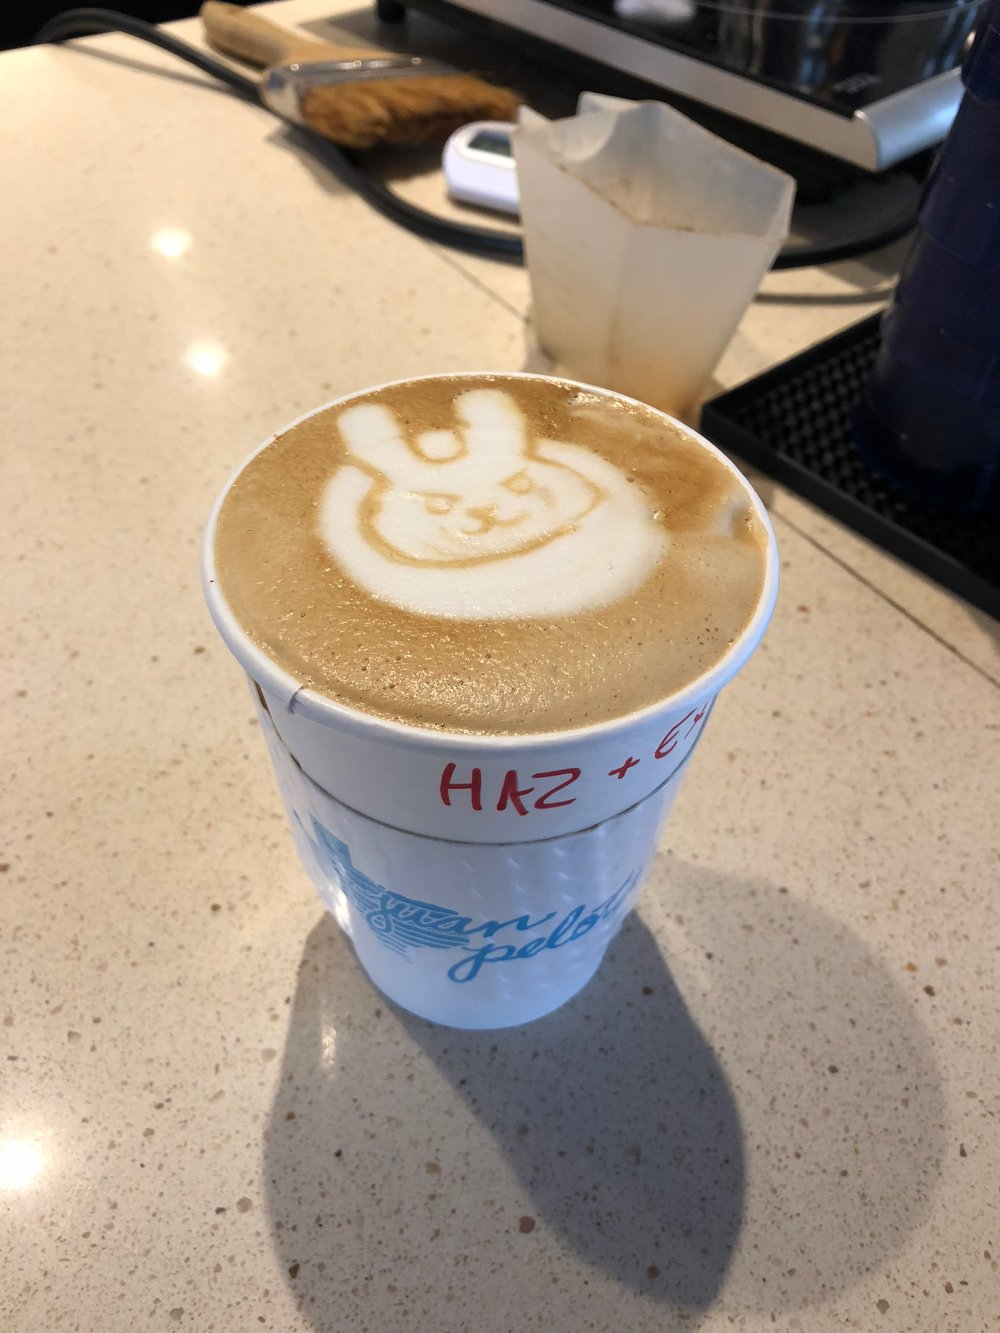 Latte art of D.Va from Juan Pelota Cafe in Austin, Texas